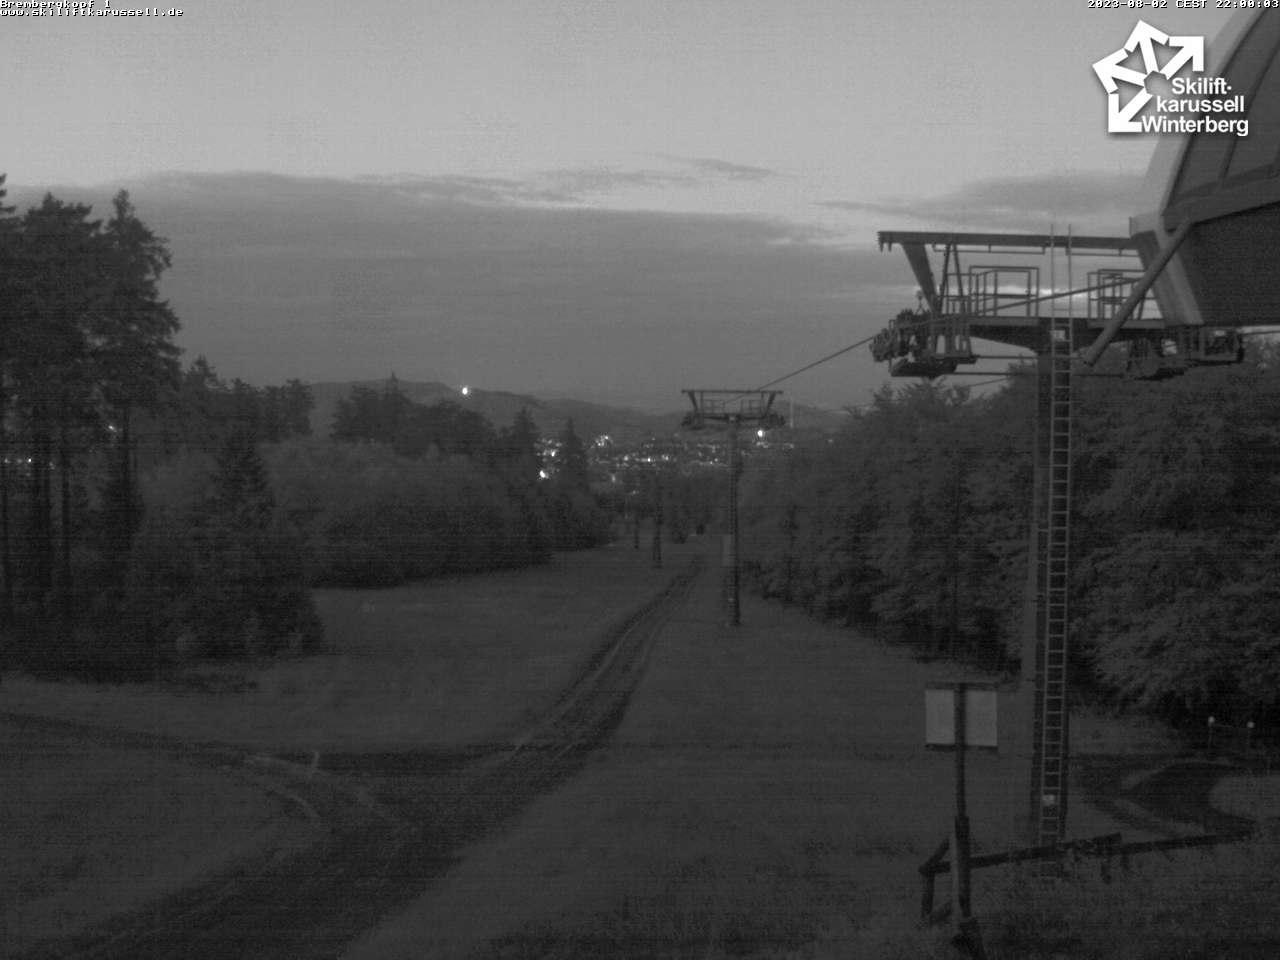 Skiliftkarussell Winterberg - Webcam 1